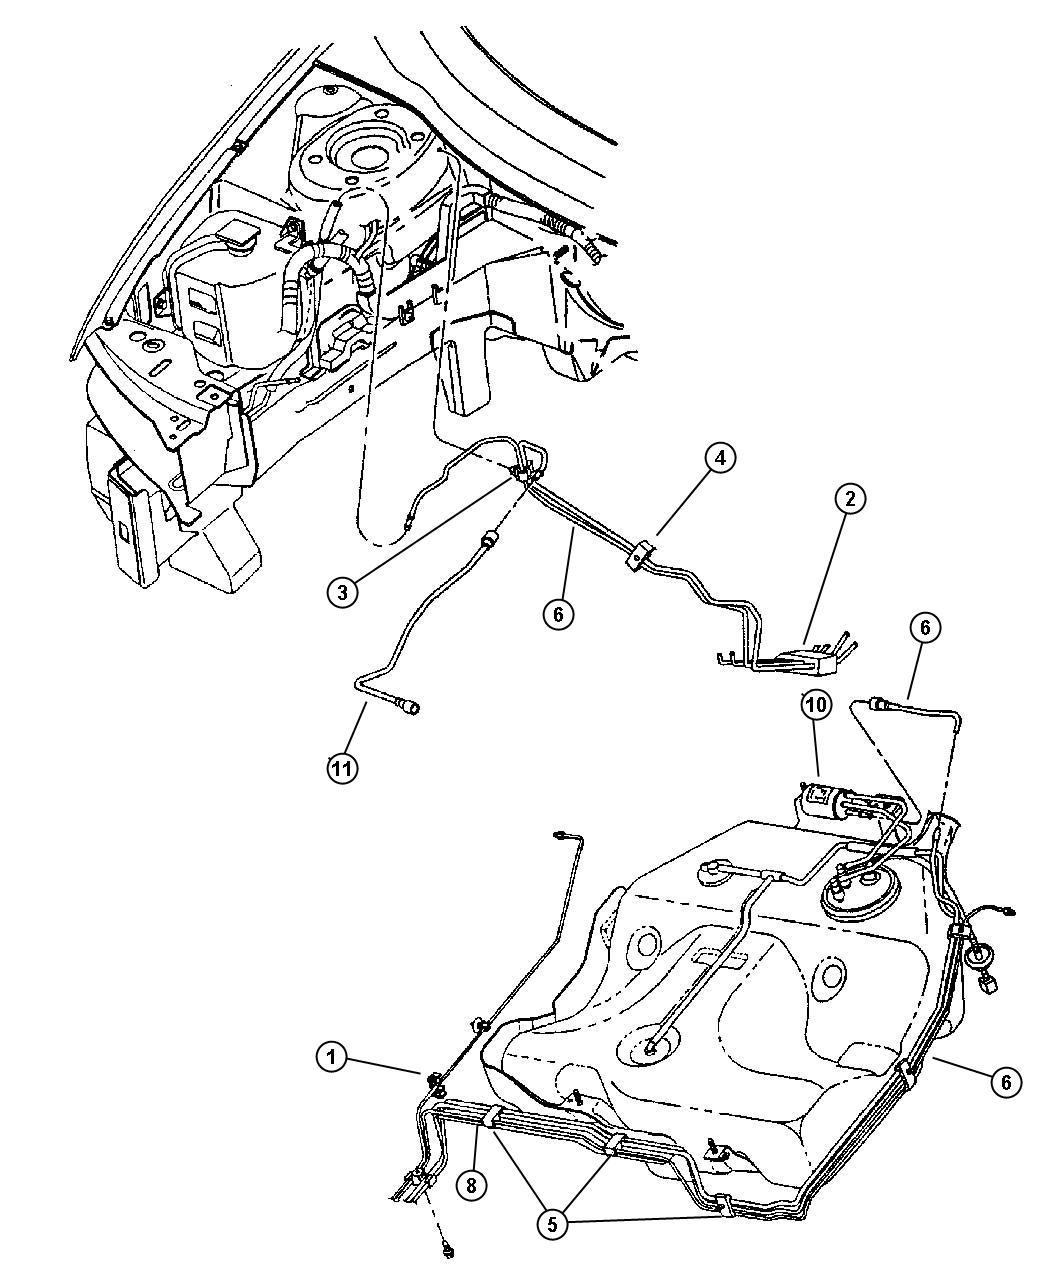 Chrysler Sebring Jx Convertible 2 5l V6 Sohc 24v Smpi